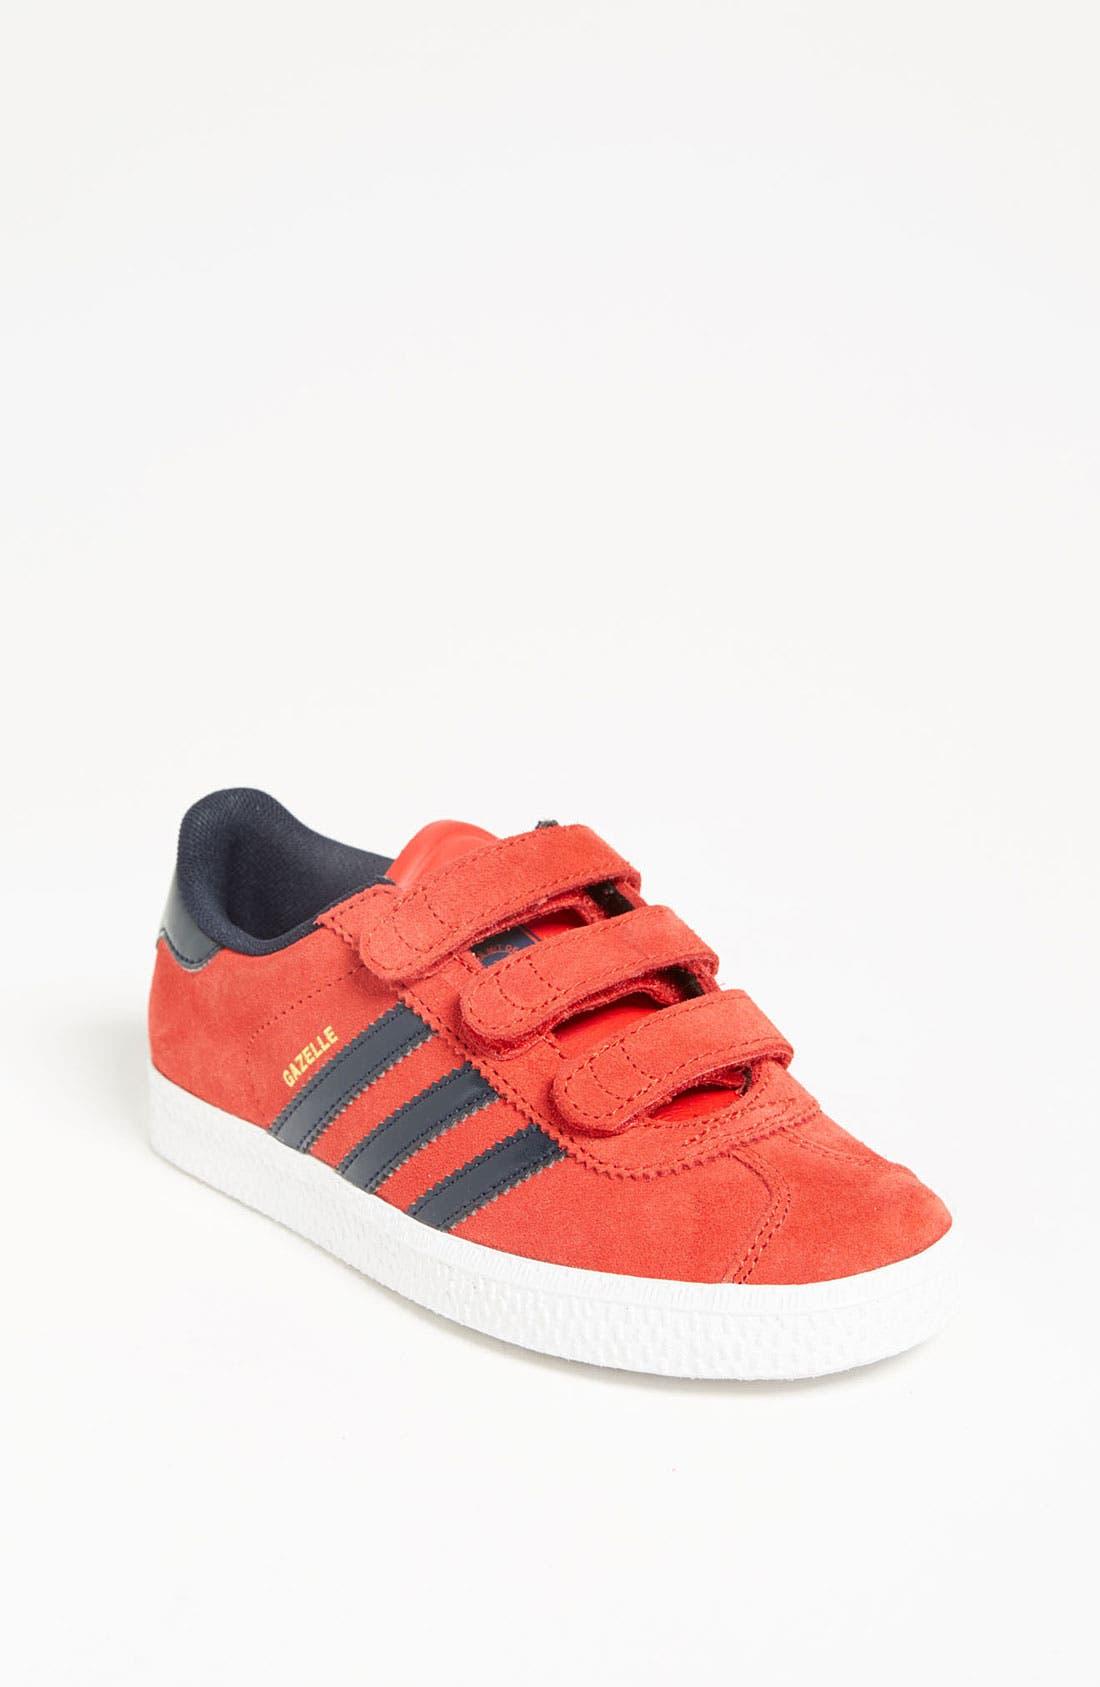 Main Image - adidas 'Gazelle' Sneaker (Toddler & Little Kid)